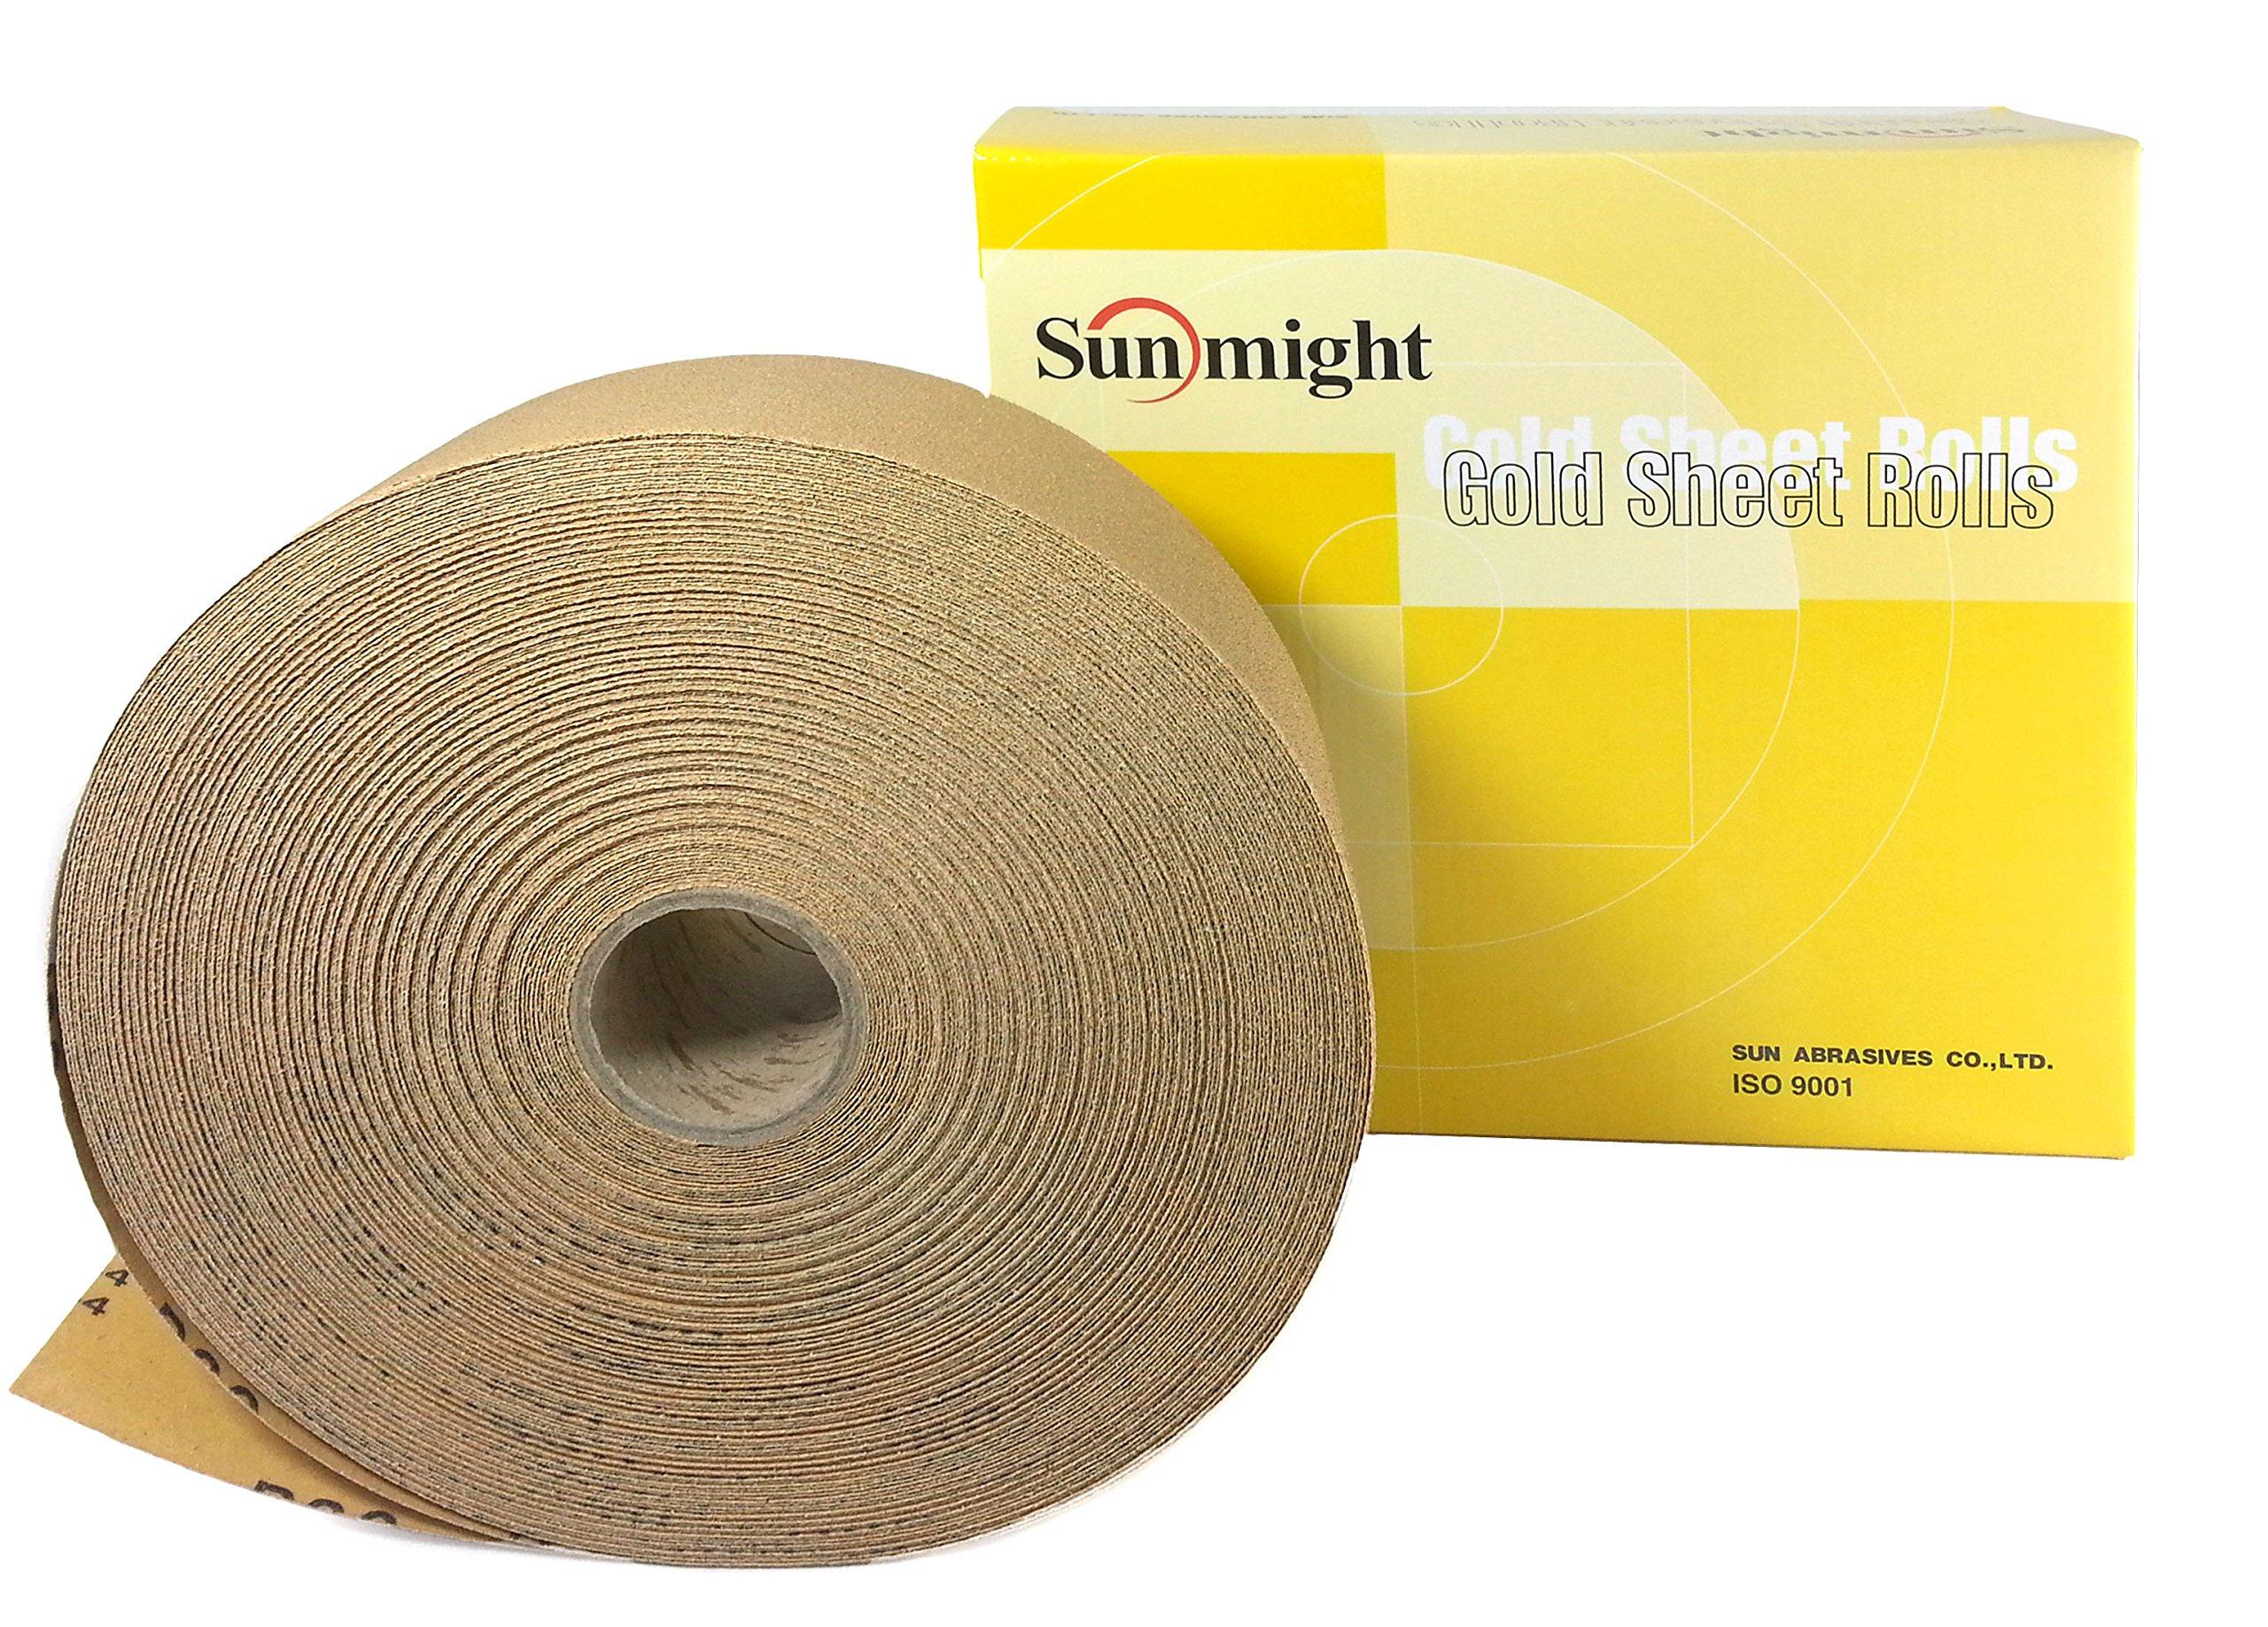 Sunmight 06108 2-3/4'' X 45 yd PSA Sheet Roll (Gold Grit 120)